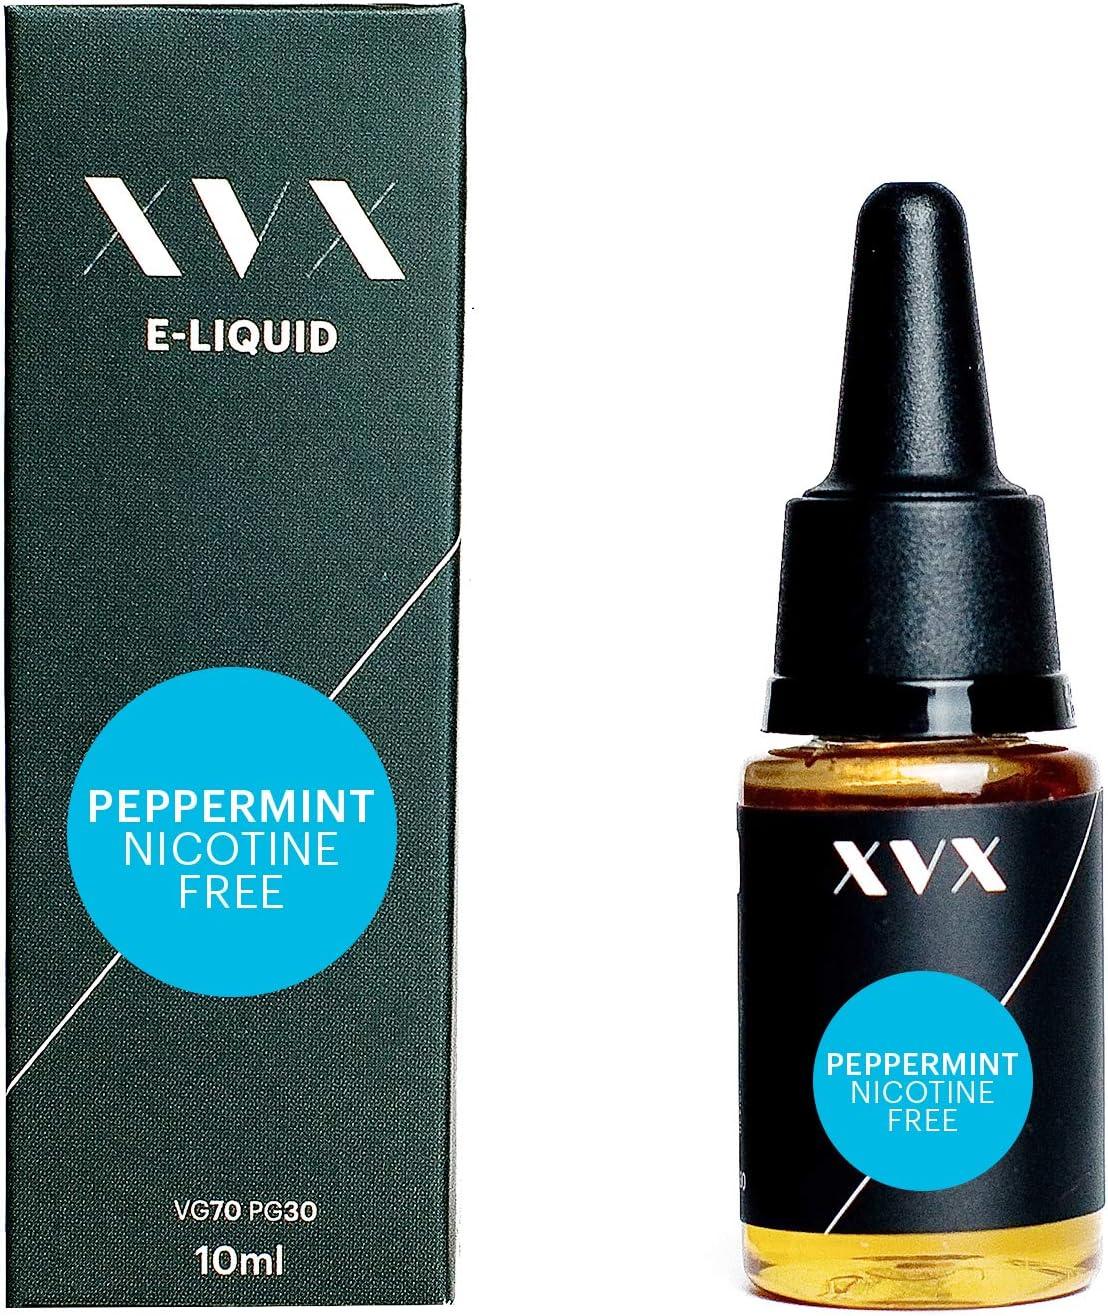 XVX E Liquid Peppermint Flavour Electronic Liquid For Vape Pen Cigarettes E Cigarette Shisha Vapouriser Liquid 10ml Nicotine Free Bottle Needle Tip Ecig E Cig